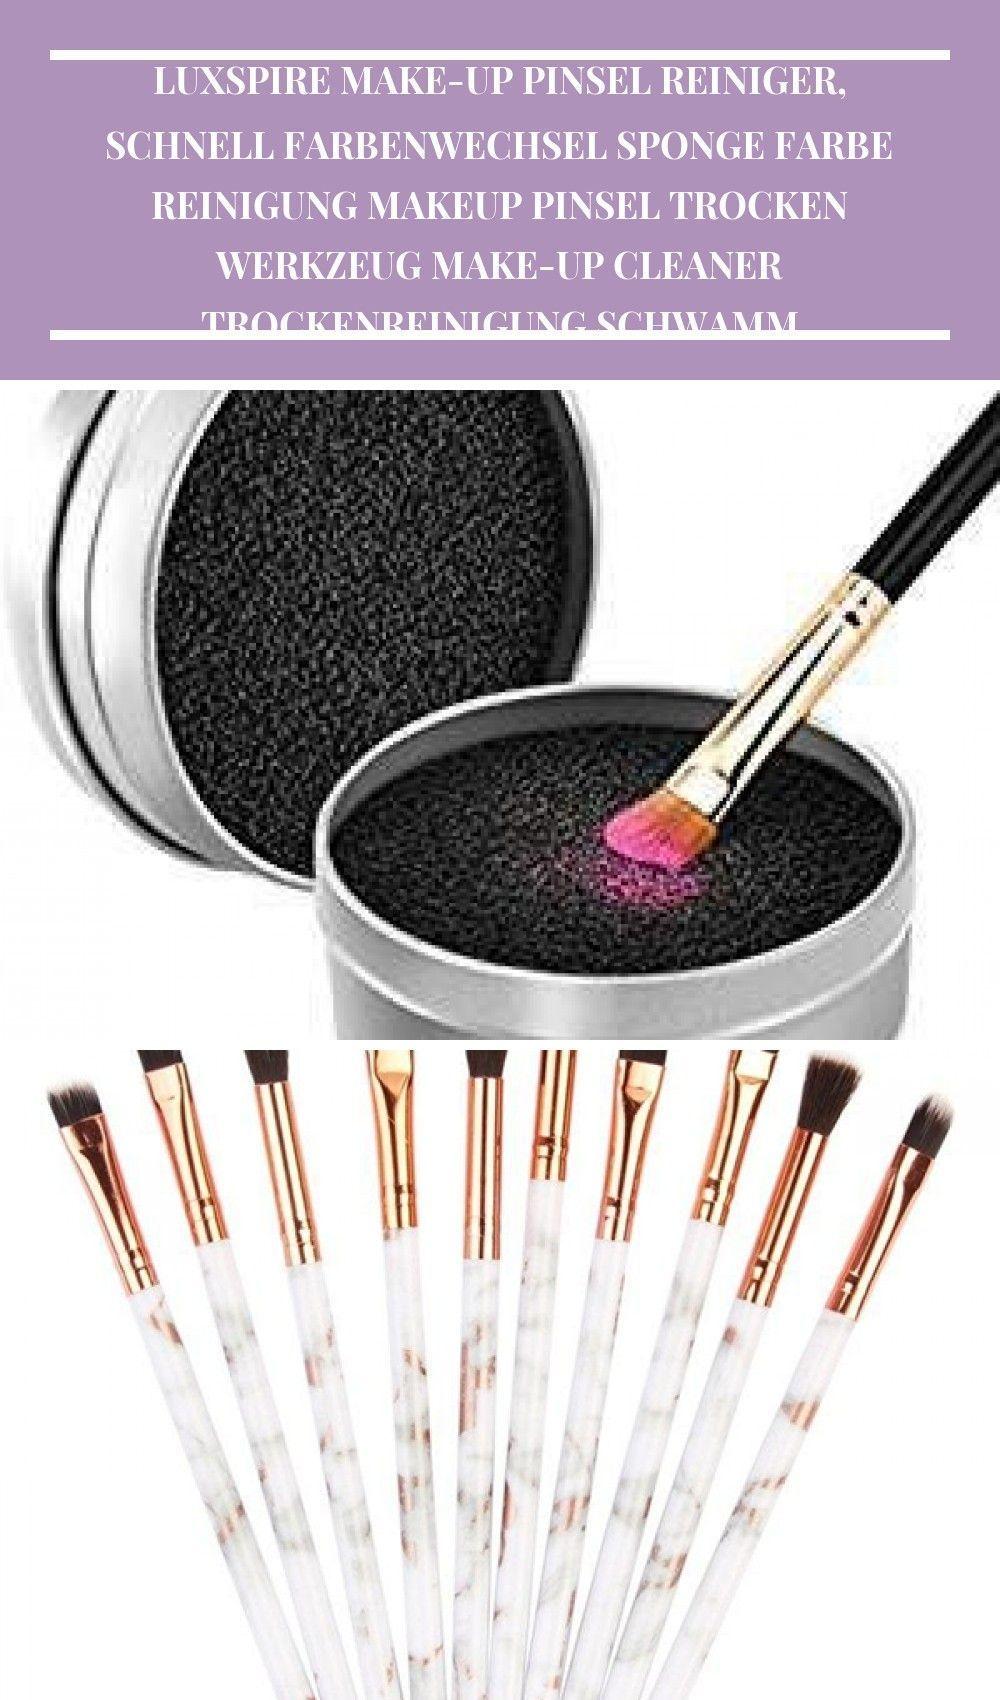 Luxspire makeup brush cleaner, quick color change, sponge